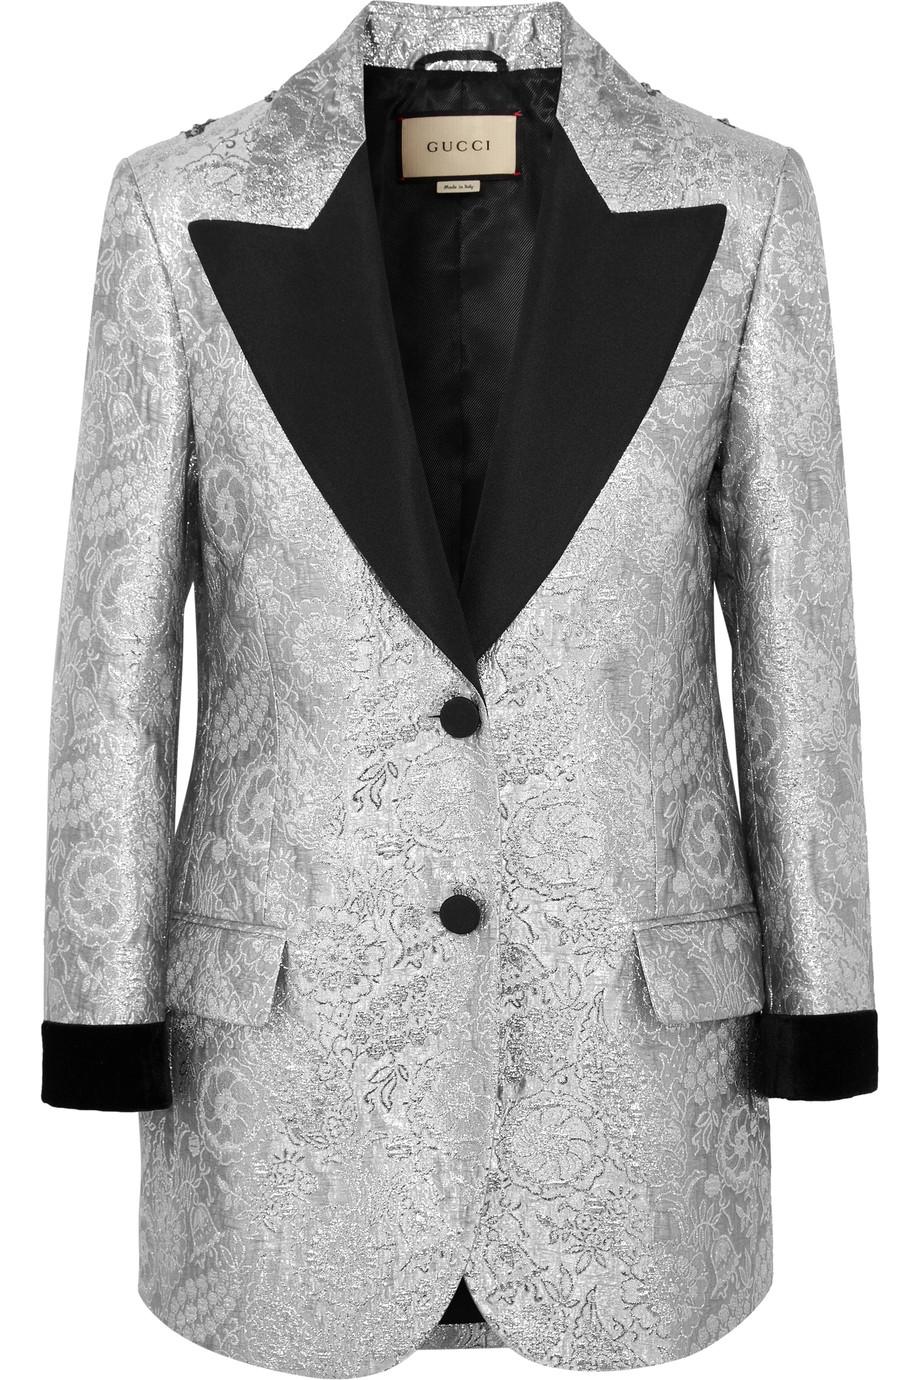 GUCCI Silver Jacquard & Velvet Blazer, Net-a-Porter $7,500